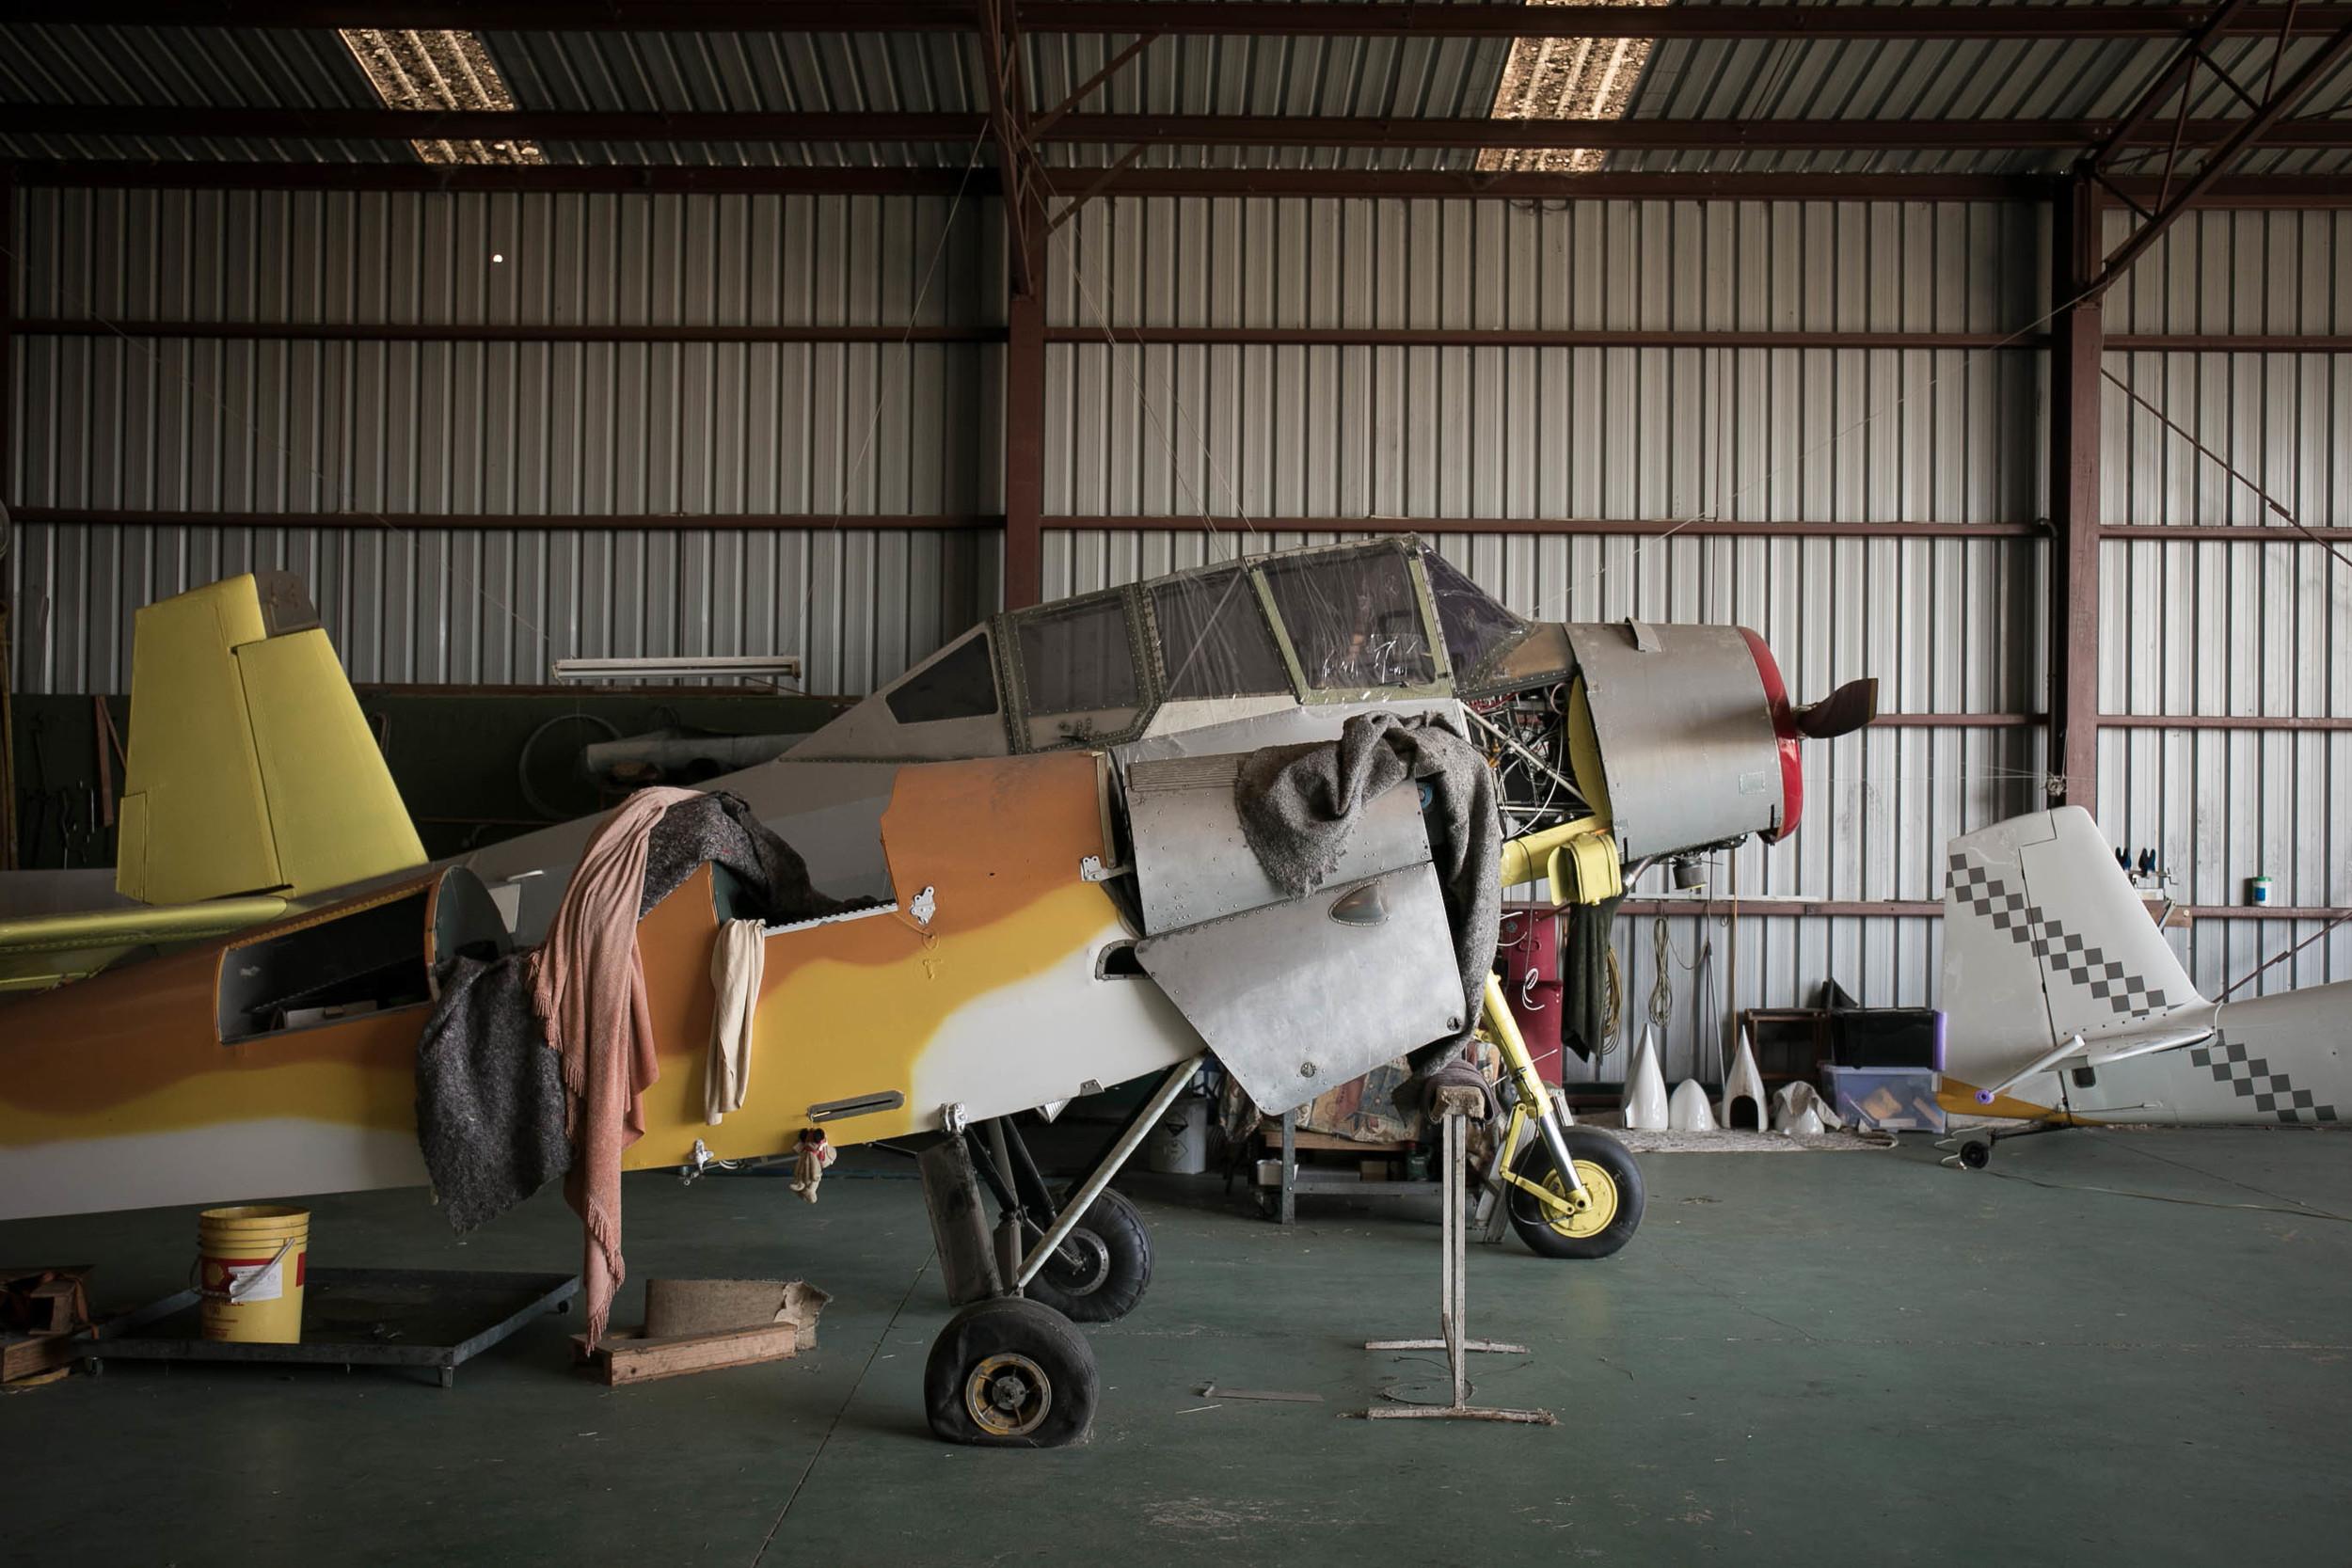 in_venus_veritas_australian_aerobatics_academy_hanger.jpg